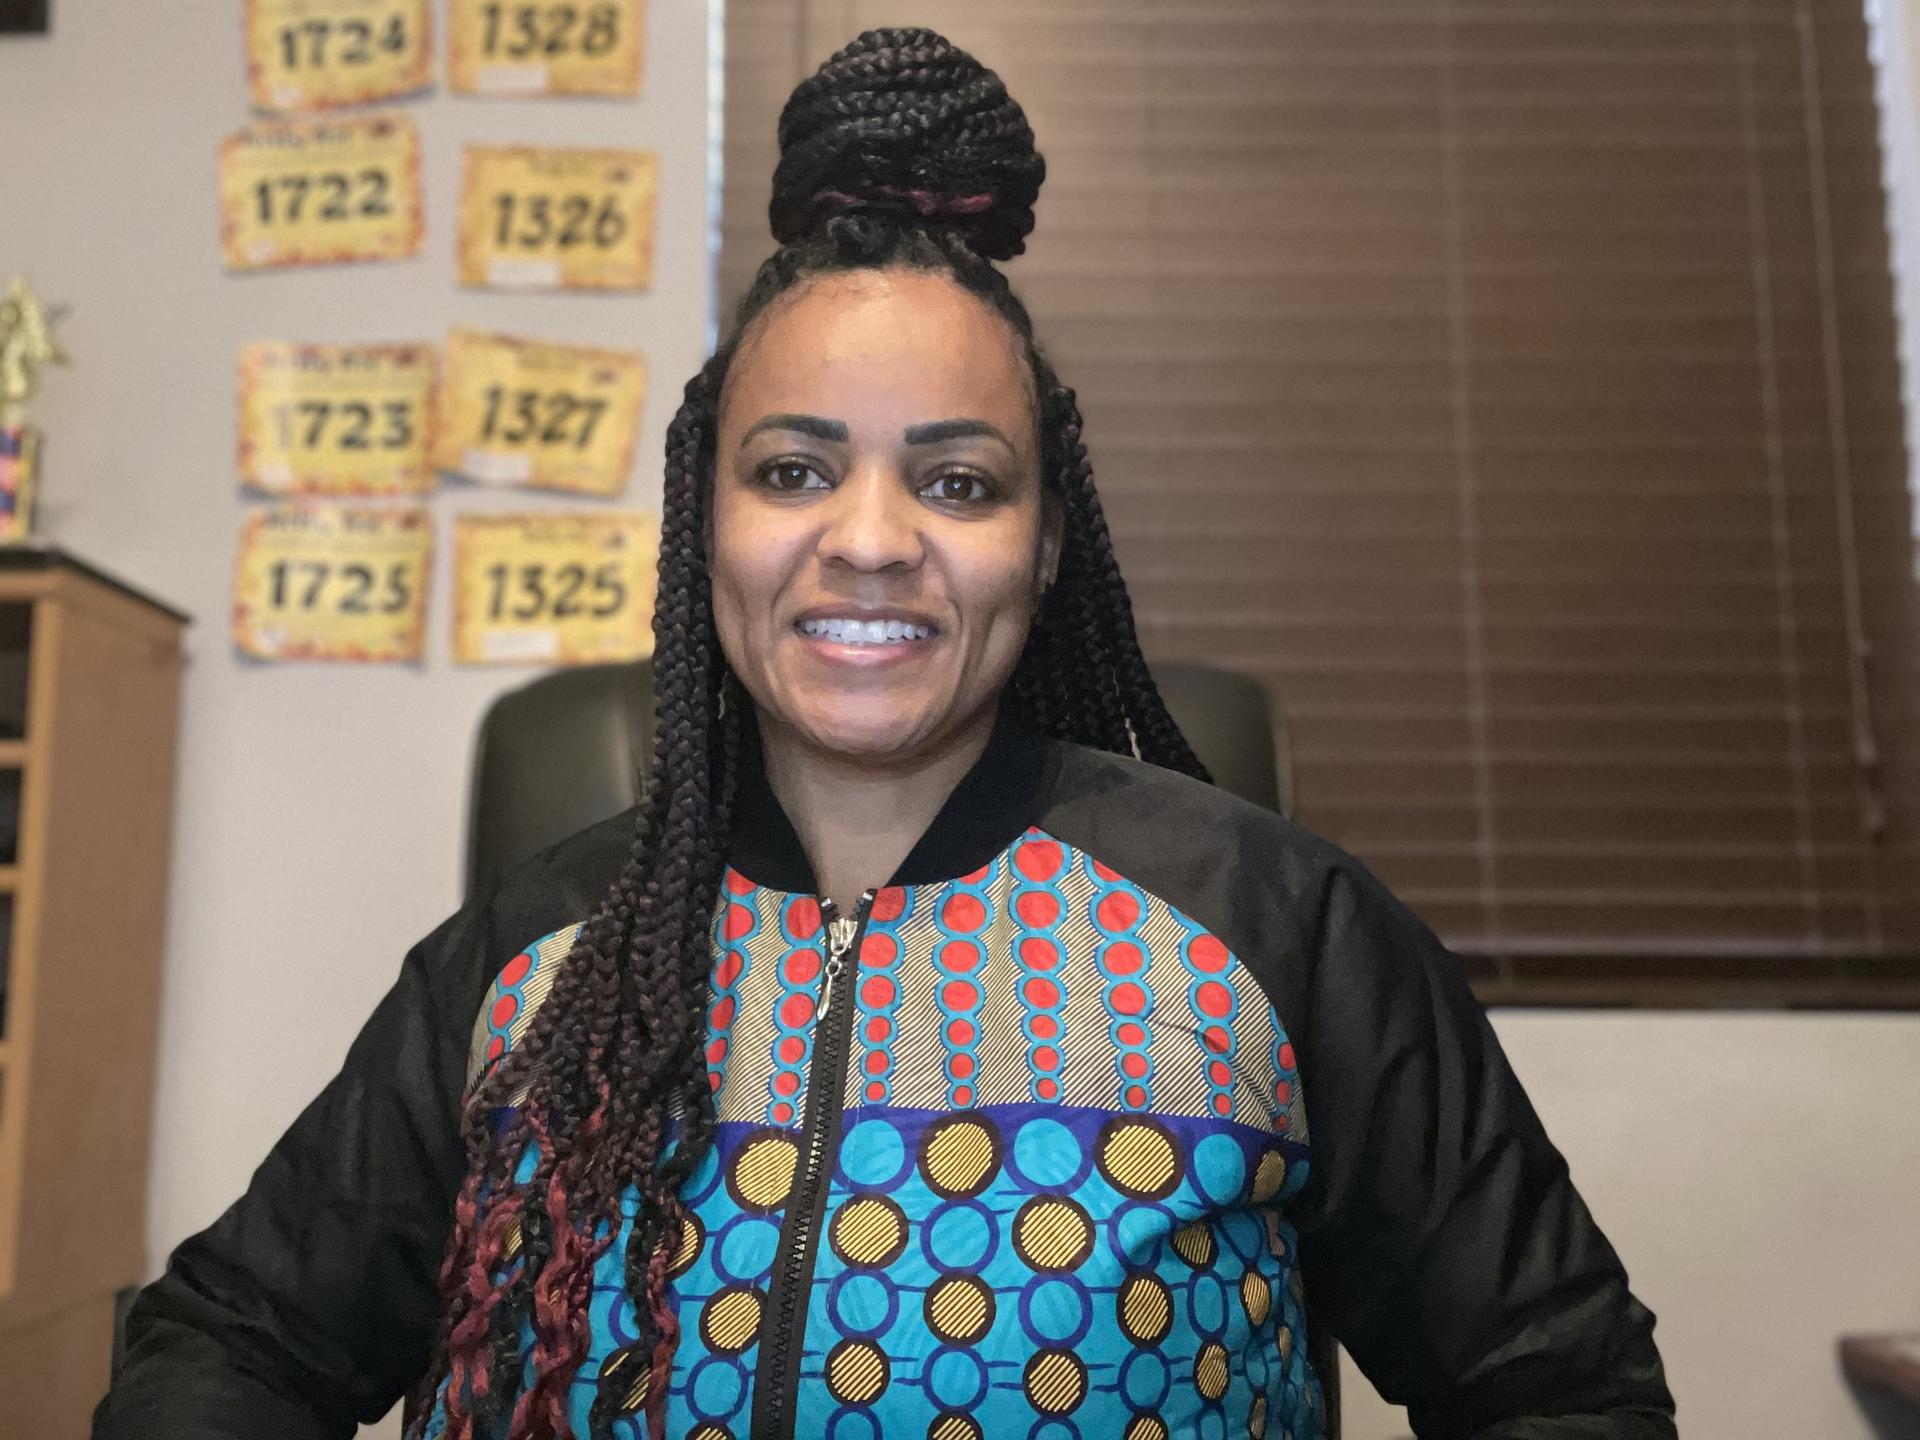 Staff member dressed for Black History Month